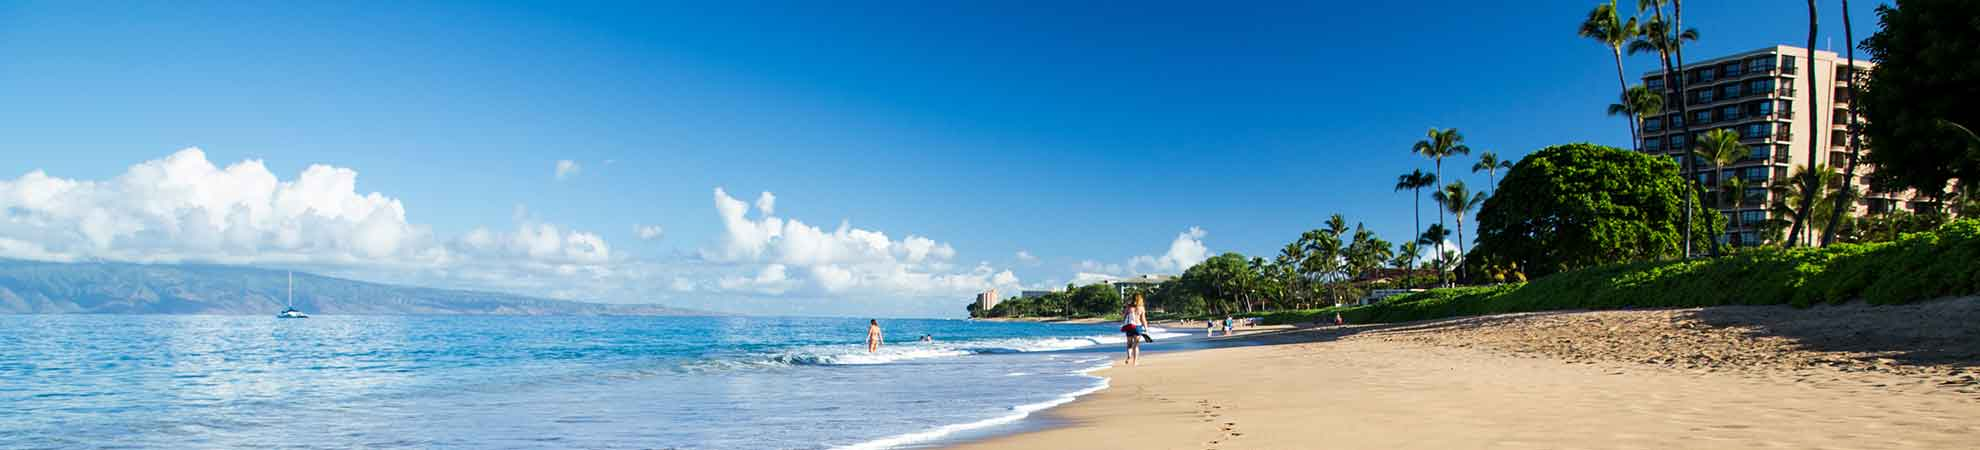 Voyage Hawaii tout inclus